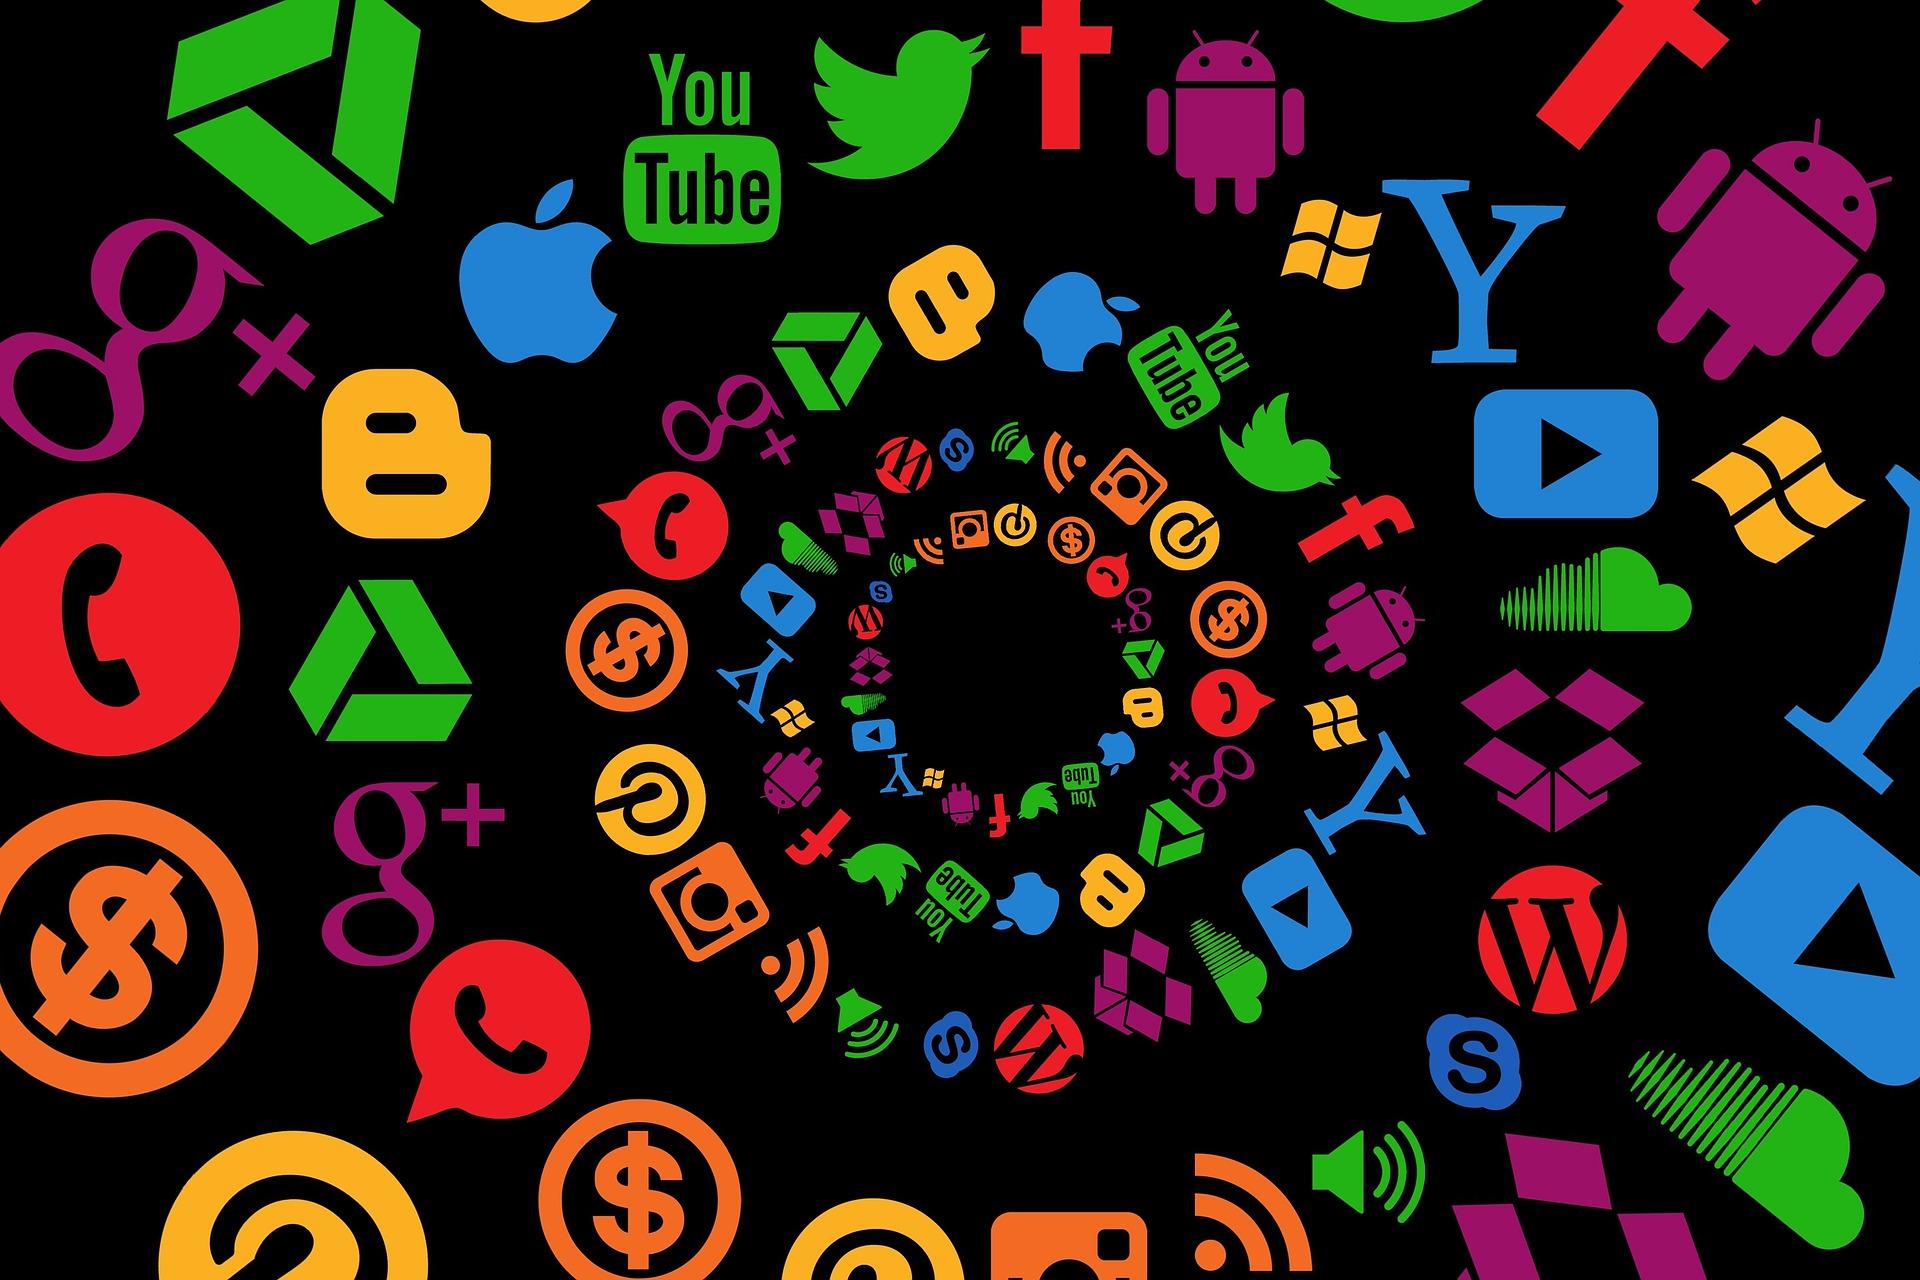 social media, apps, smartphone, technology.jpg